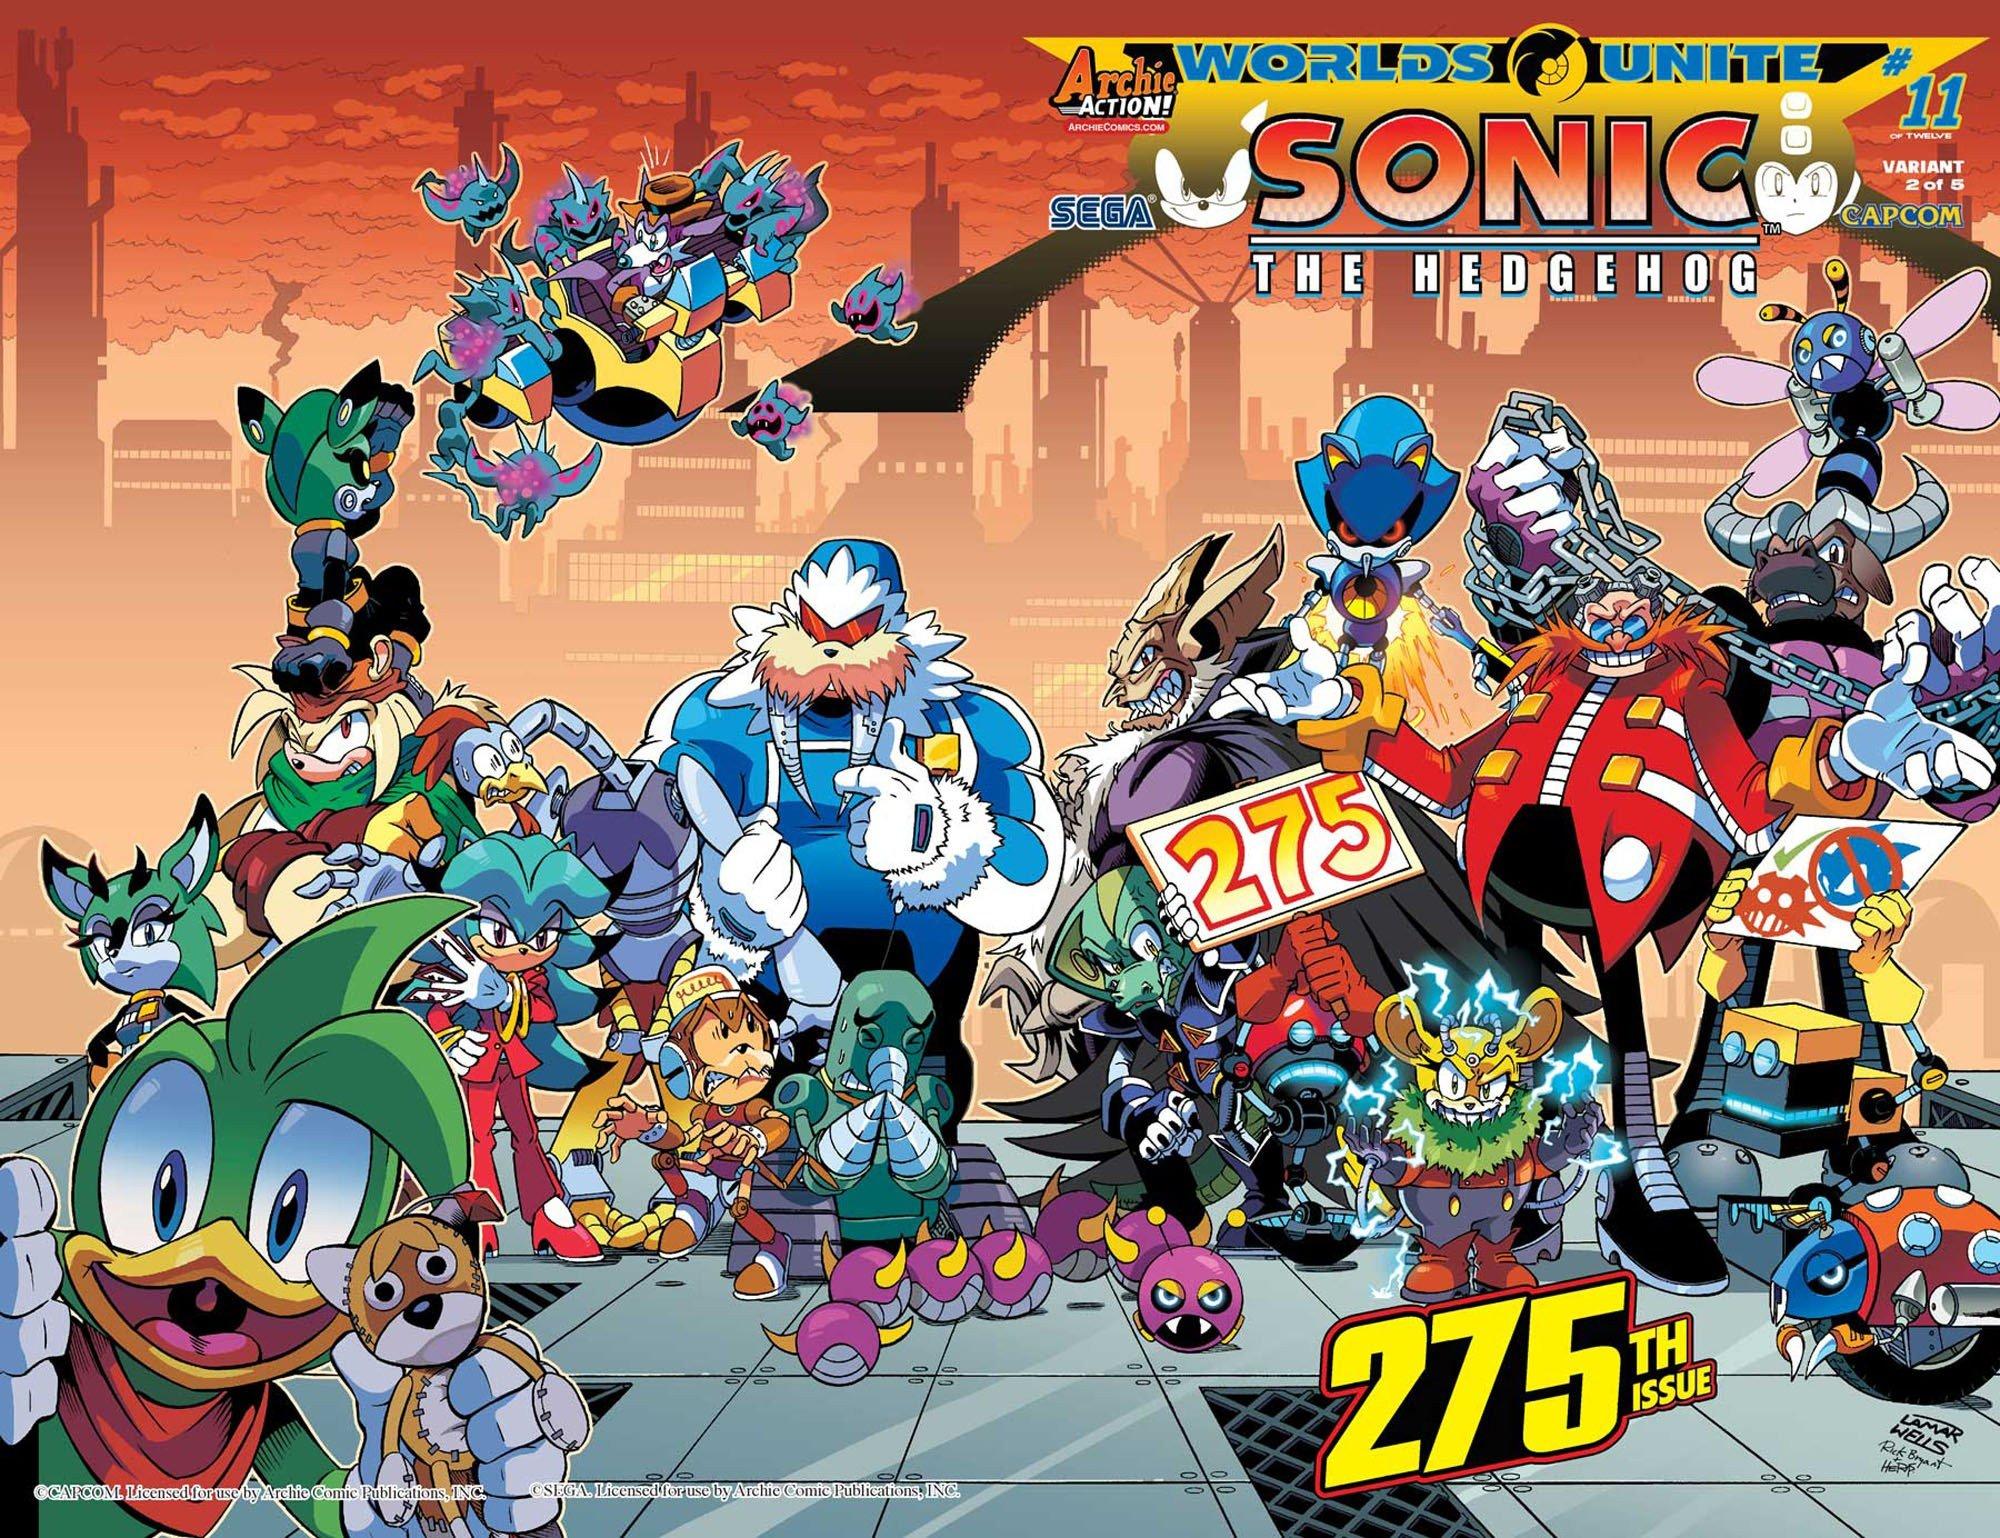 Sonic the Hedgehog 275 (October 2015) (variant 2)